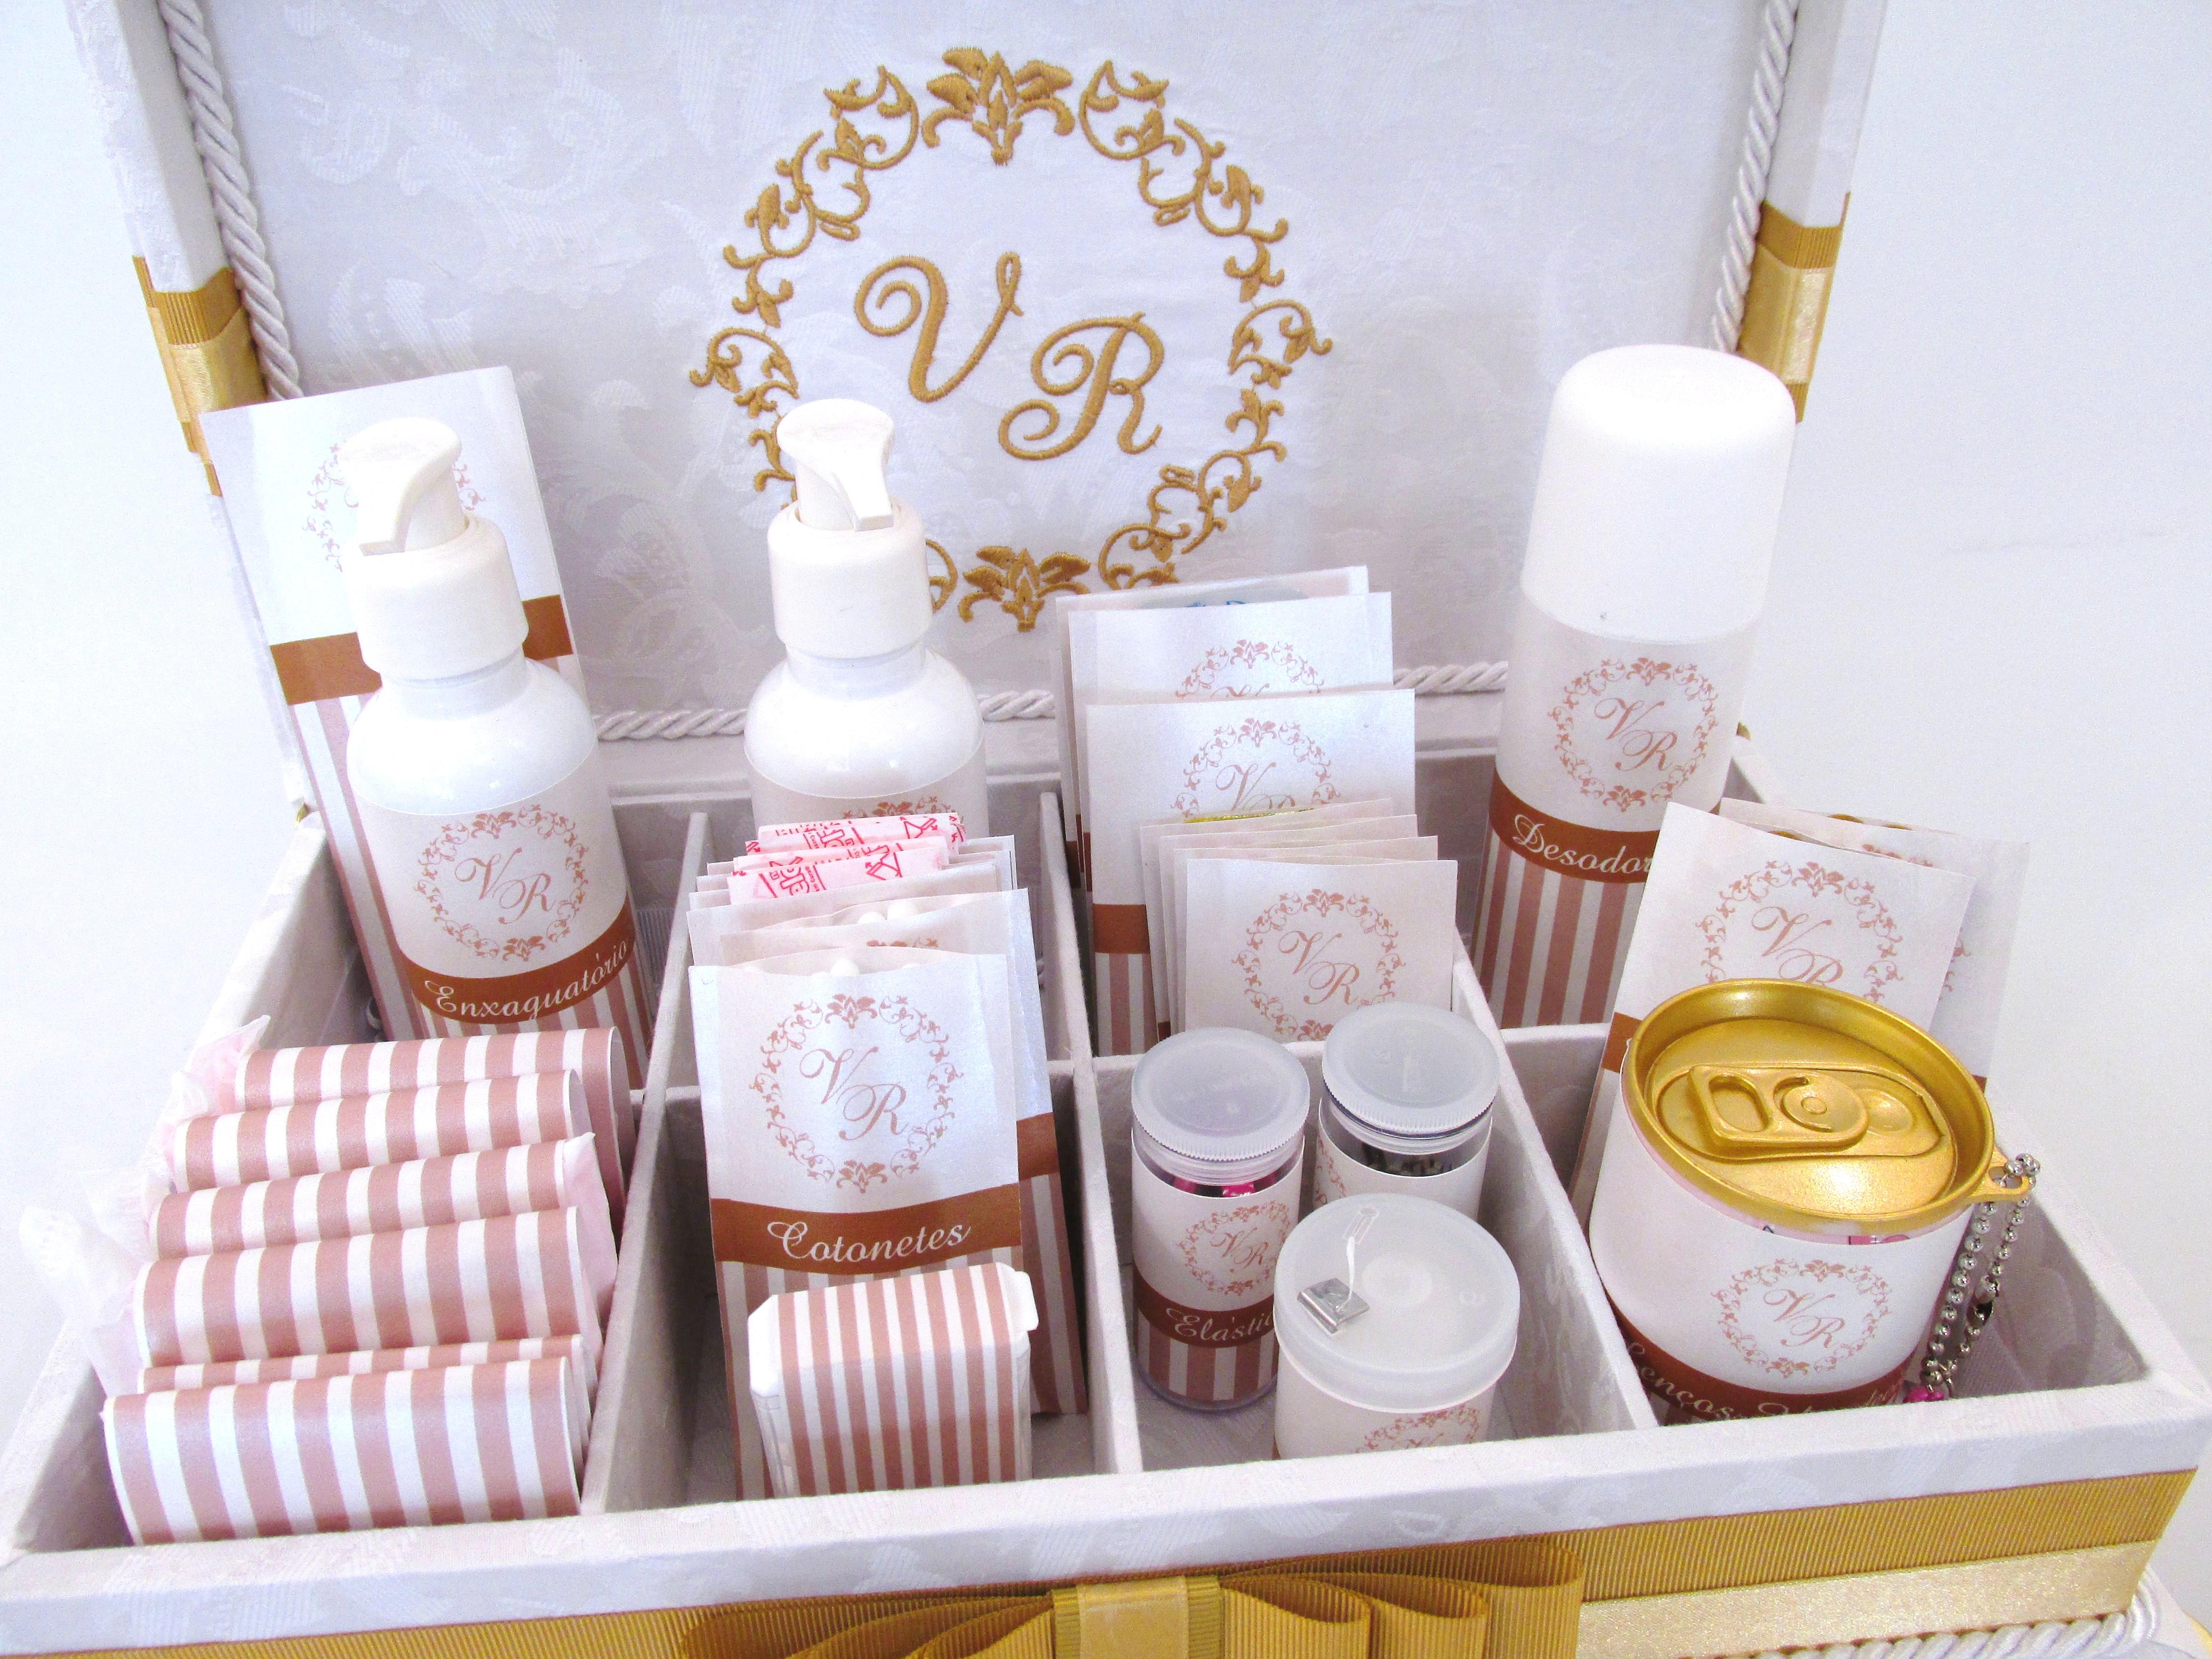 Molde Kit Banheiro Casamento Como Fazer : Caixa kit banheiro para casamento divina elo